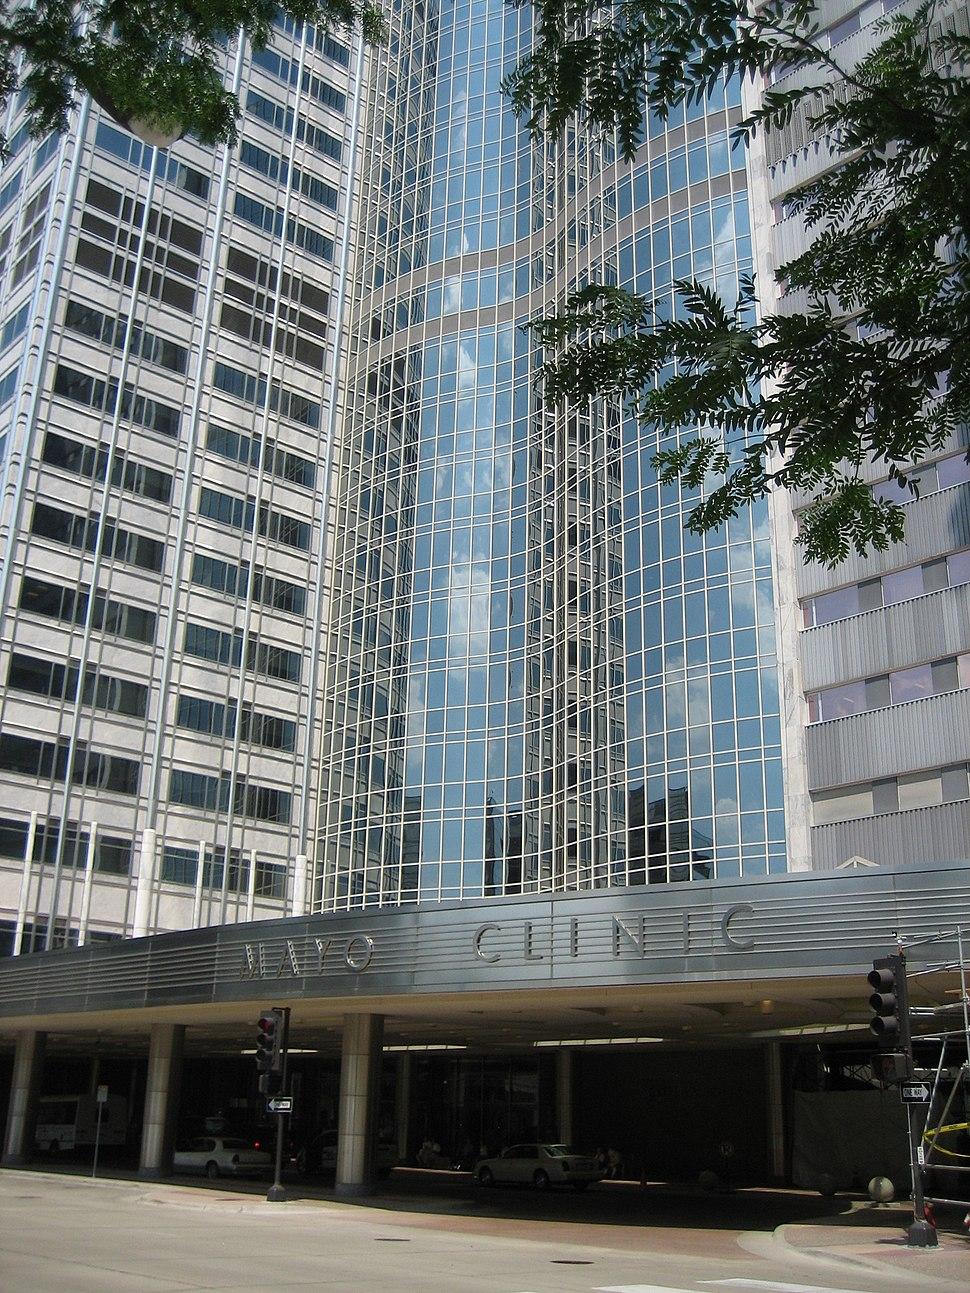 Mayo Clinic Rochester Gonda w trees 3890p